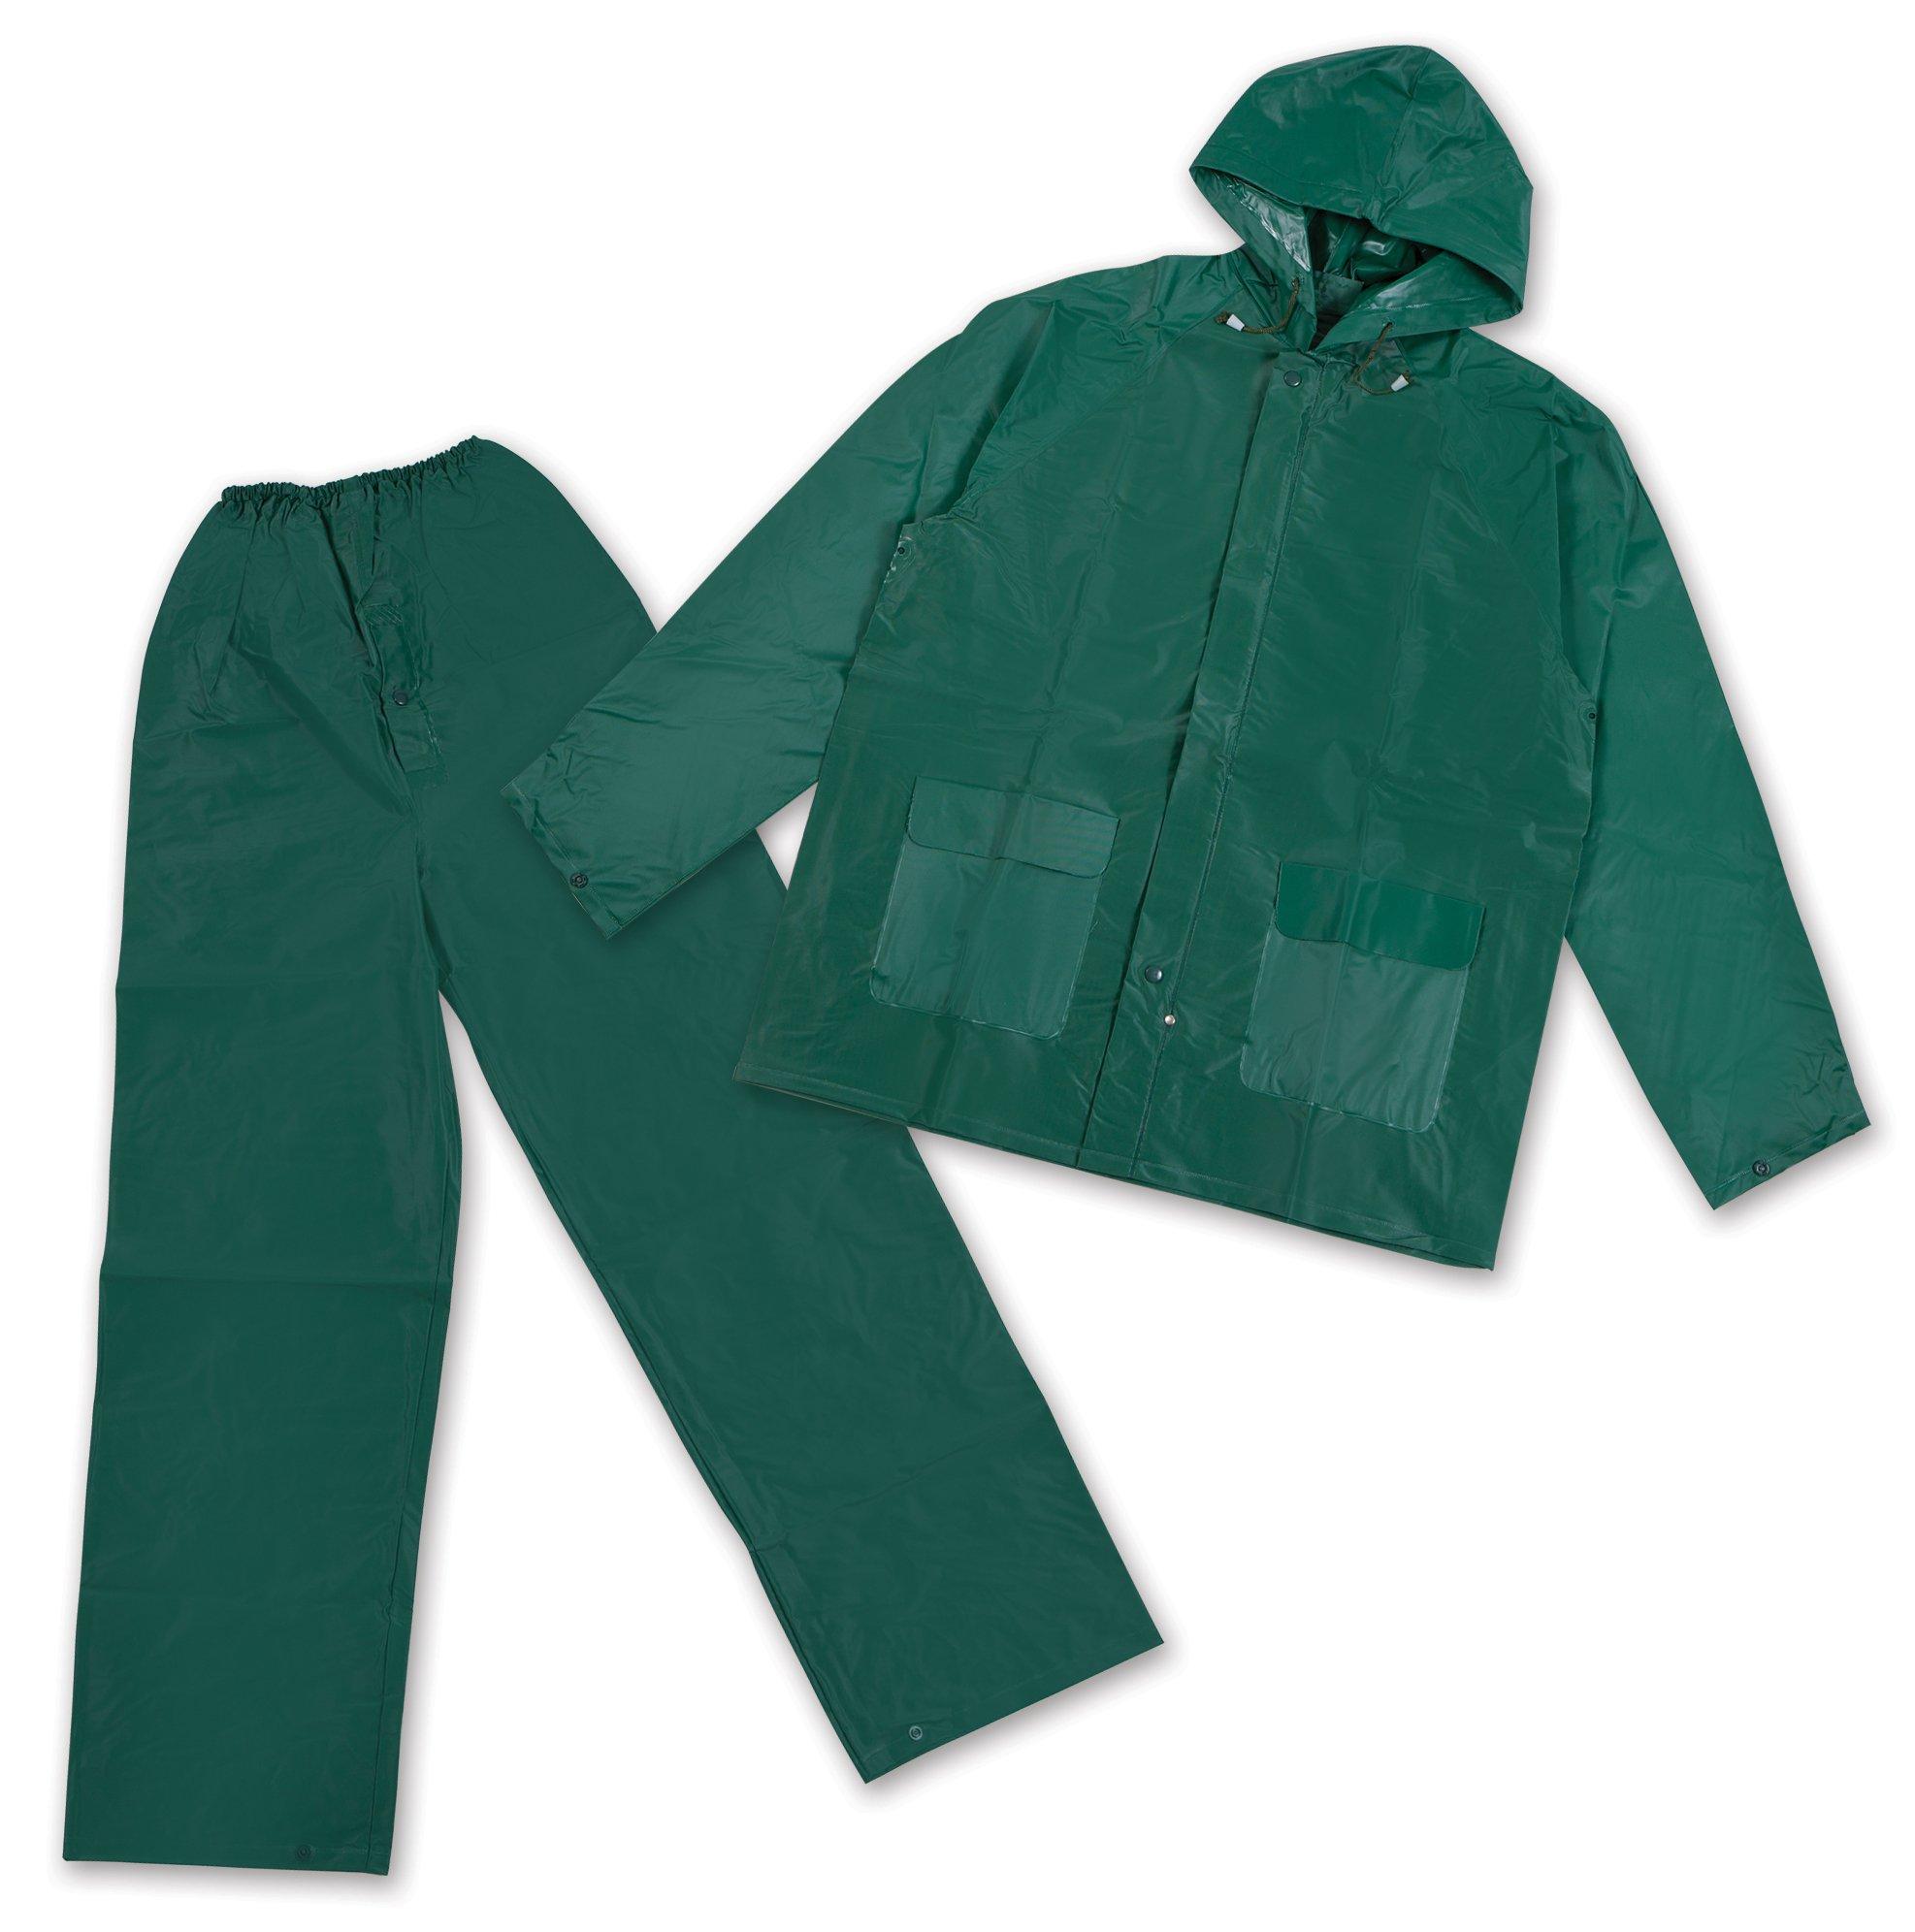 Stansport Men's Pvc Rainsuit with Hood, Green, X-Large